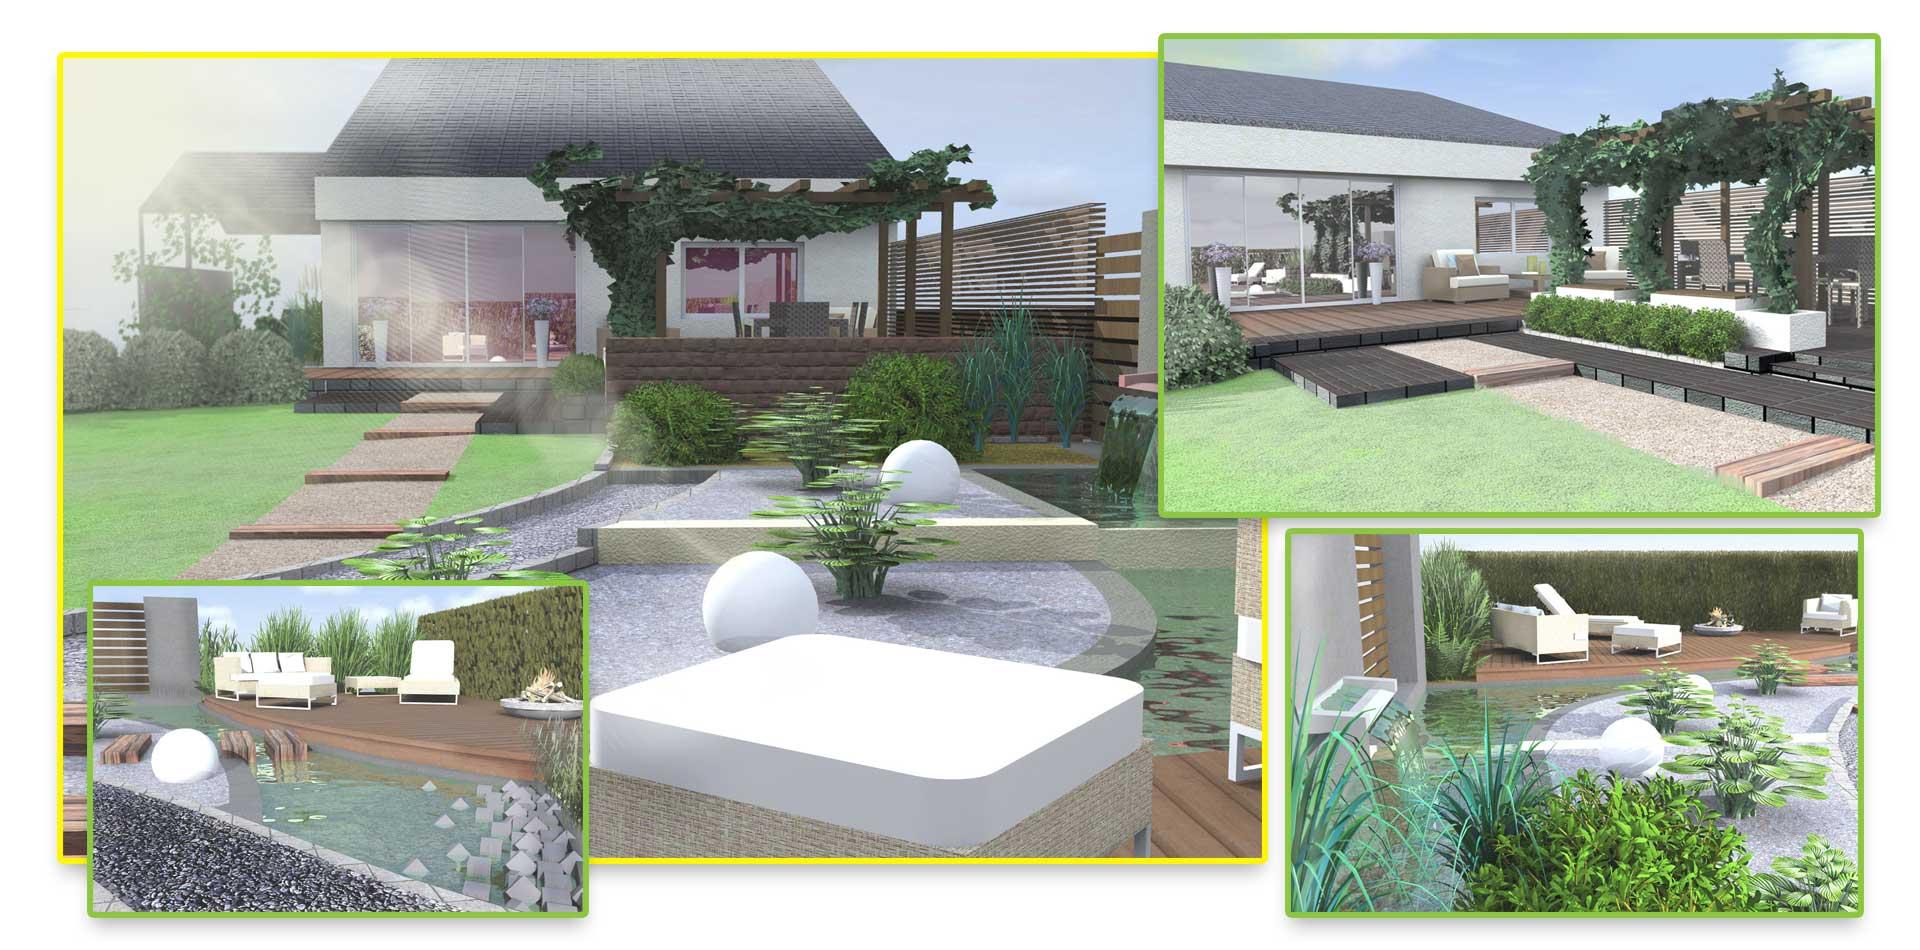 Projekt ogrodu Człuchów